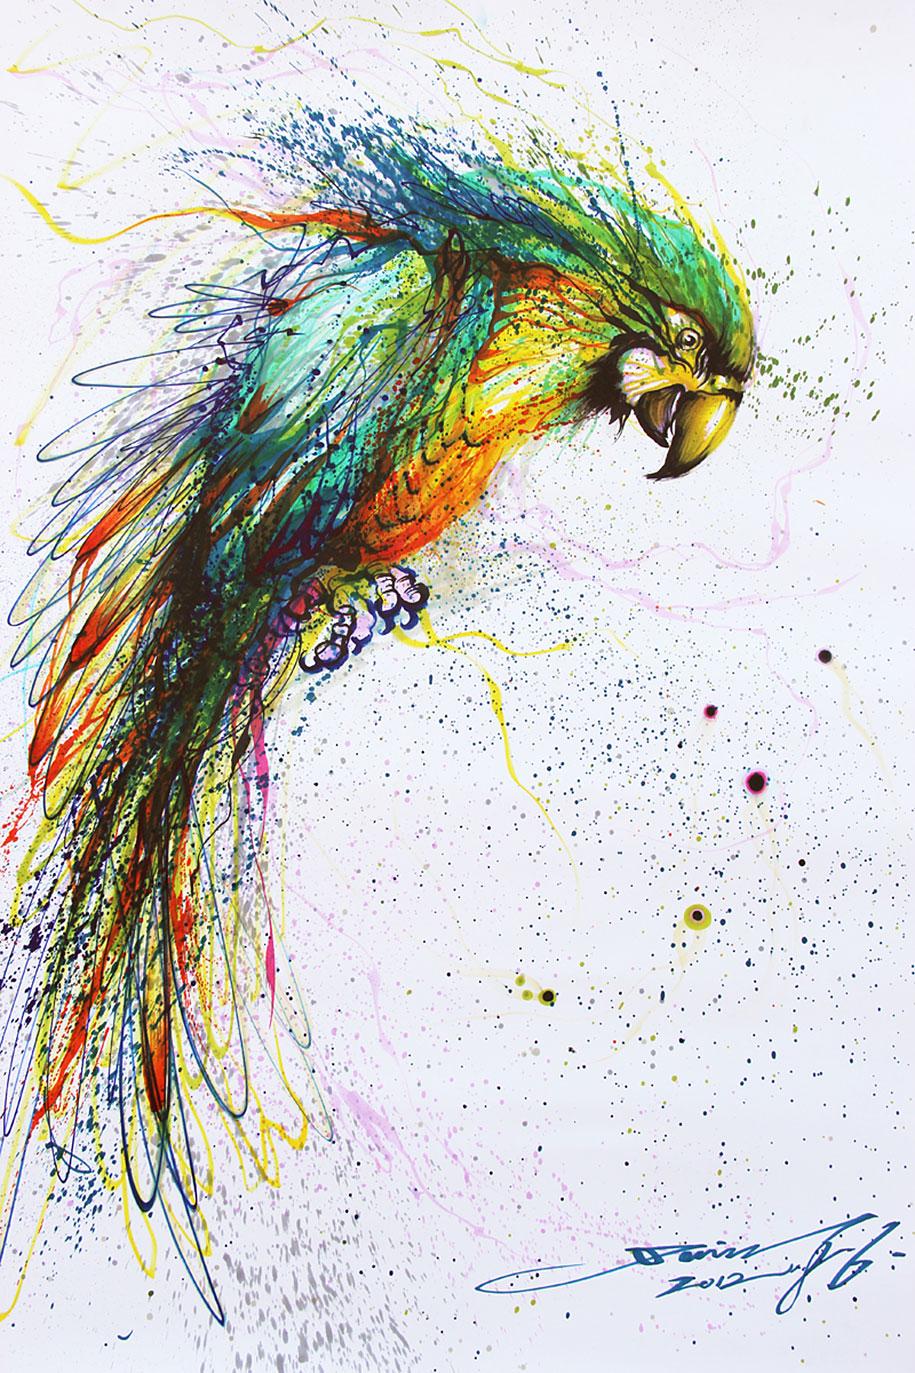 animal-paintings-ink-on-paper-hua-tunan-18